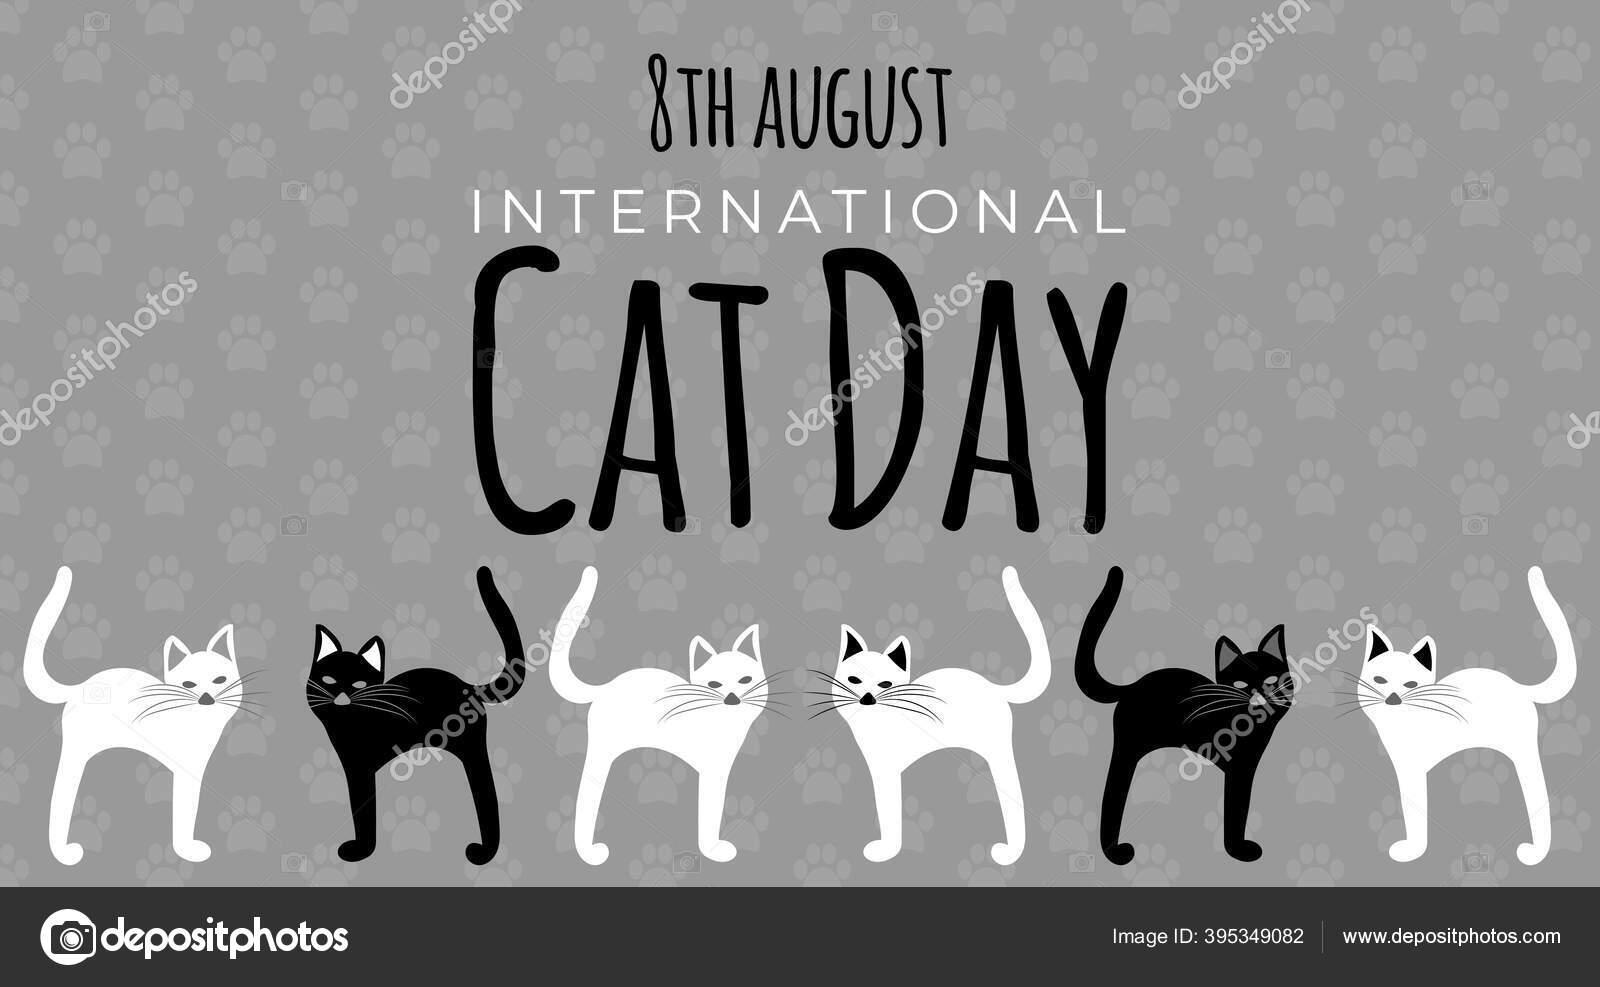 International Cat Day Stock Vectors Royalty Free International Cat Day Illustrations Depositphotos